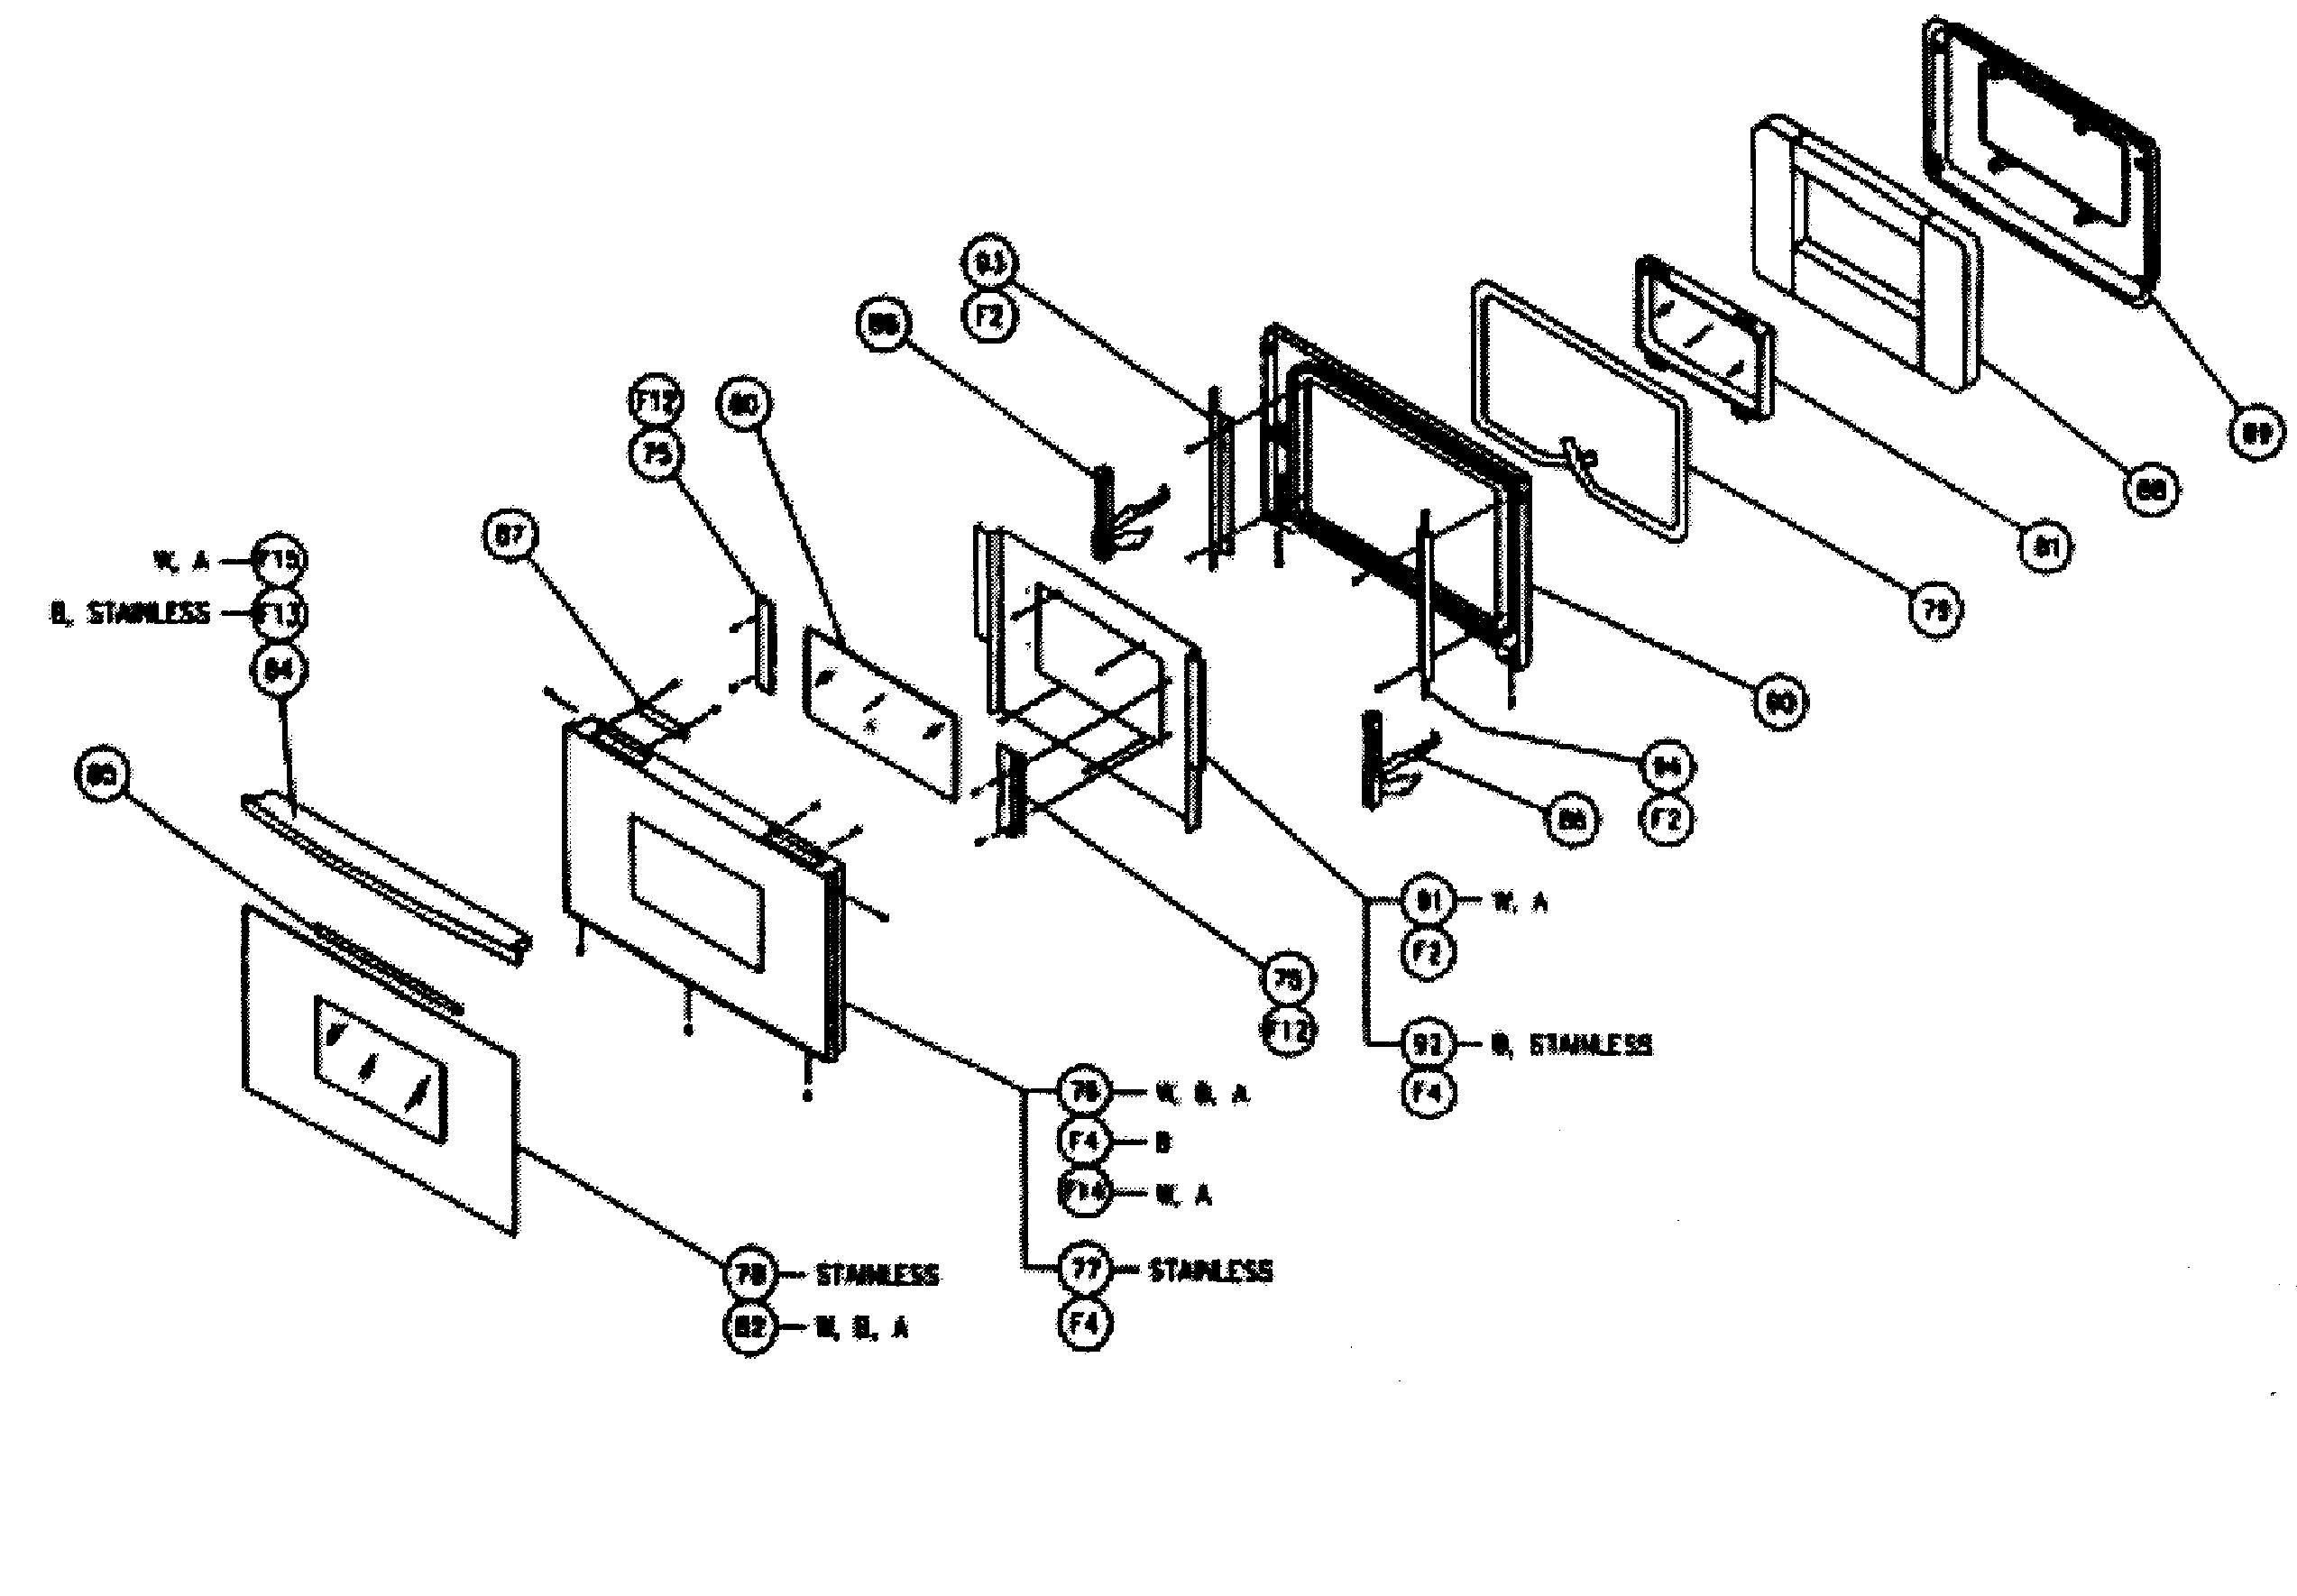 dacor dishwasher wiring diagram